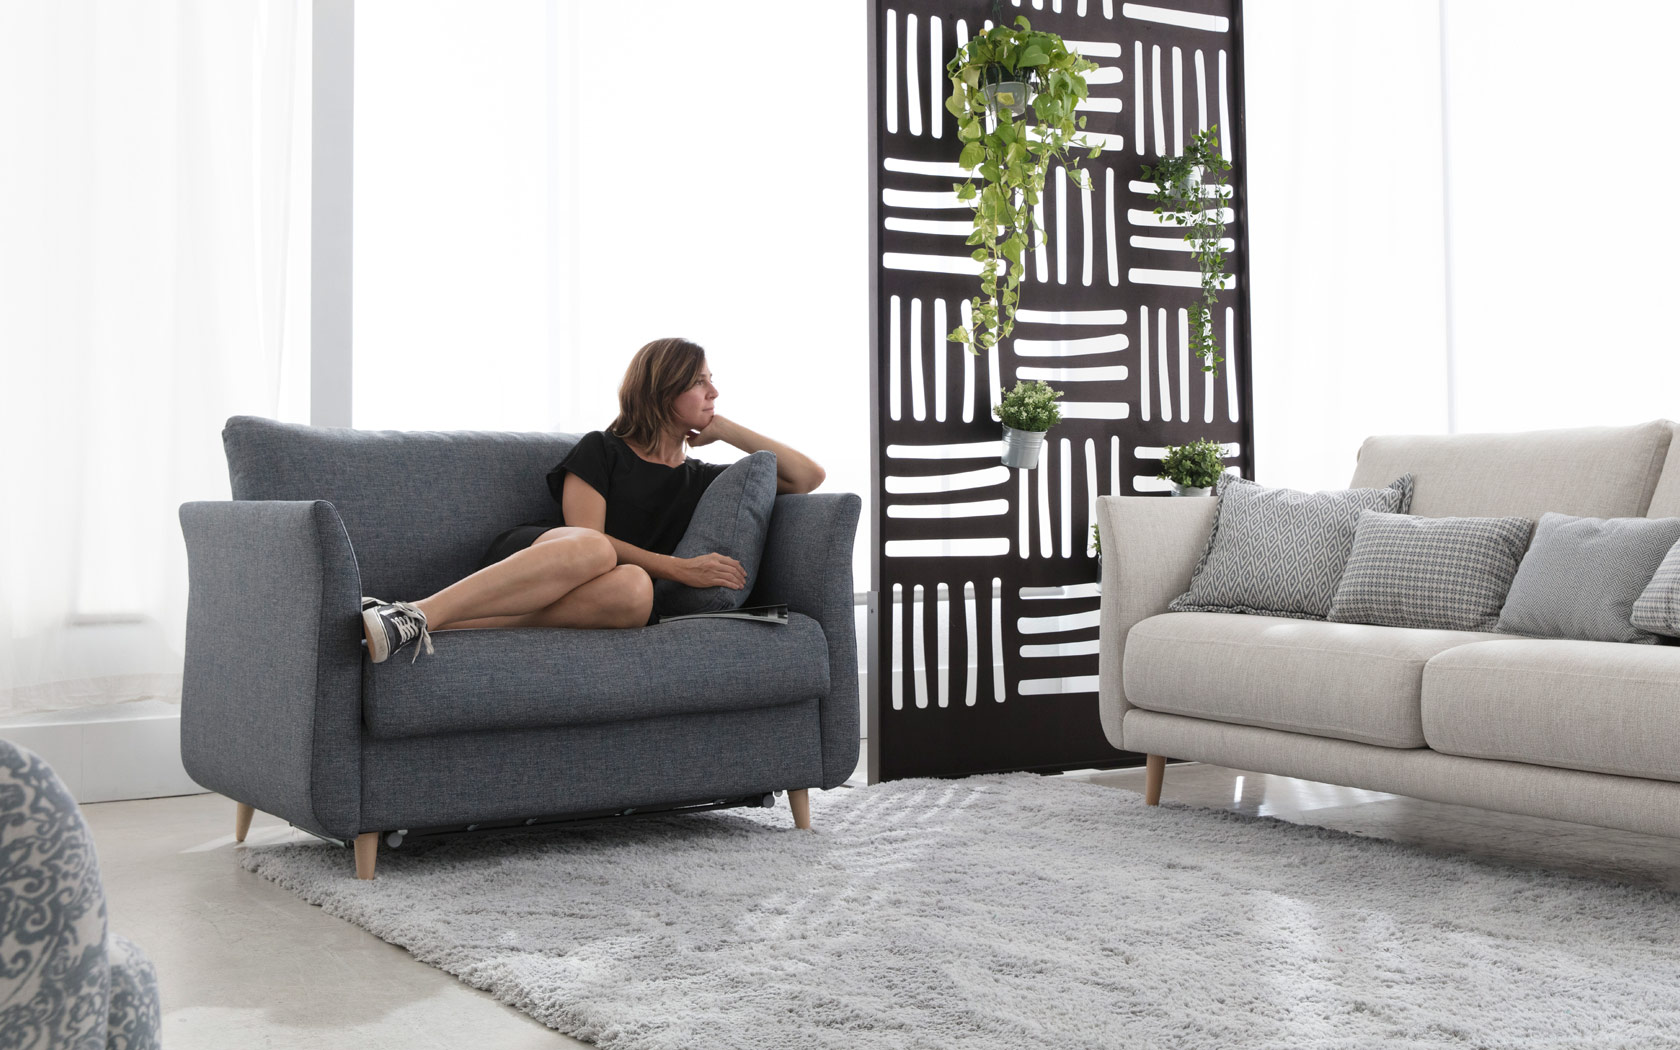 Helsinki sillón cama 2020 05